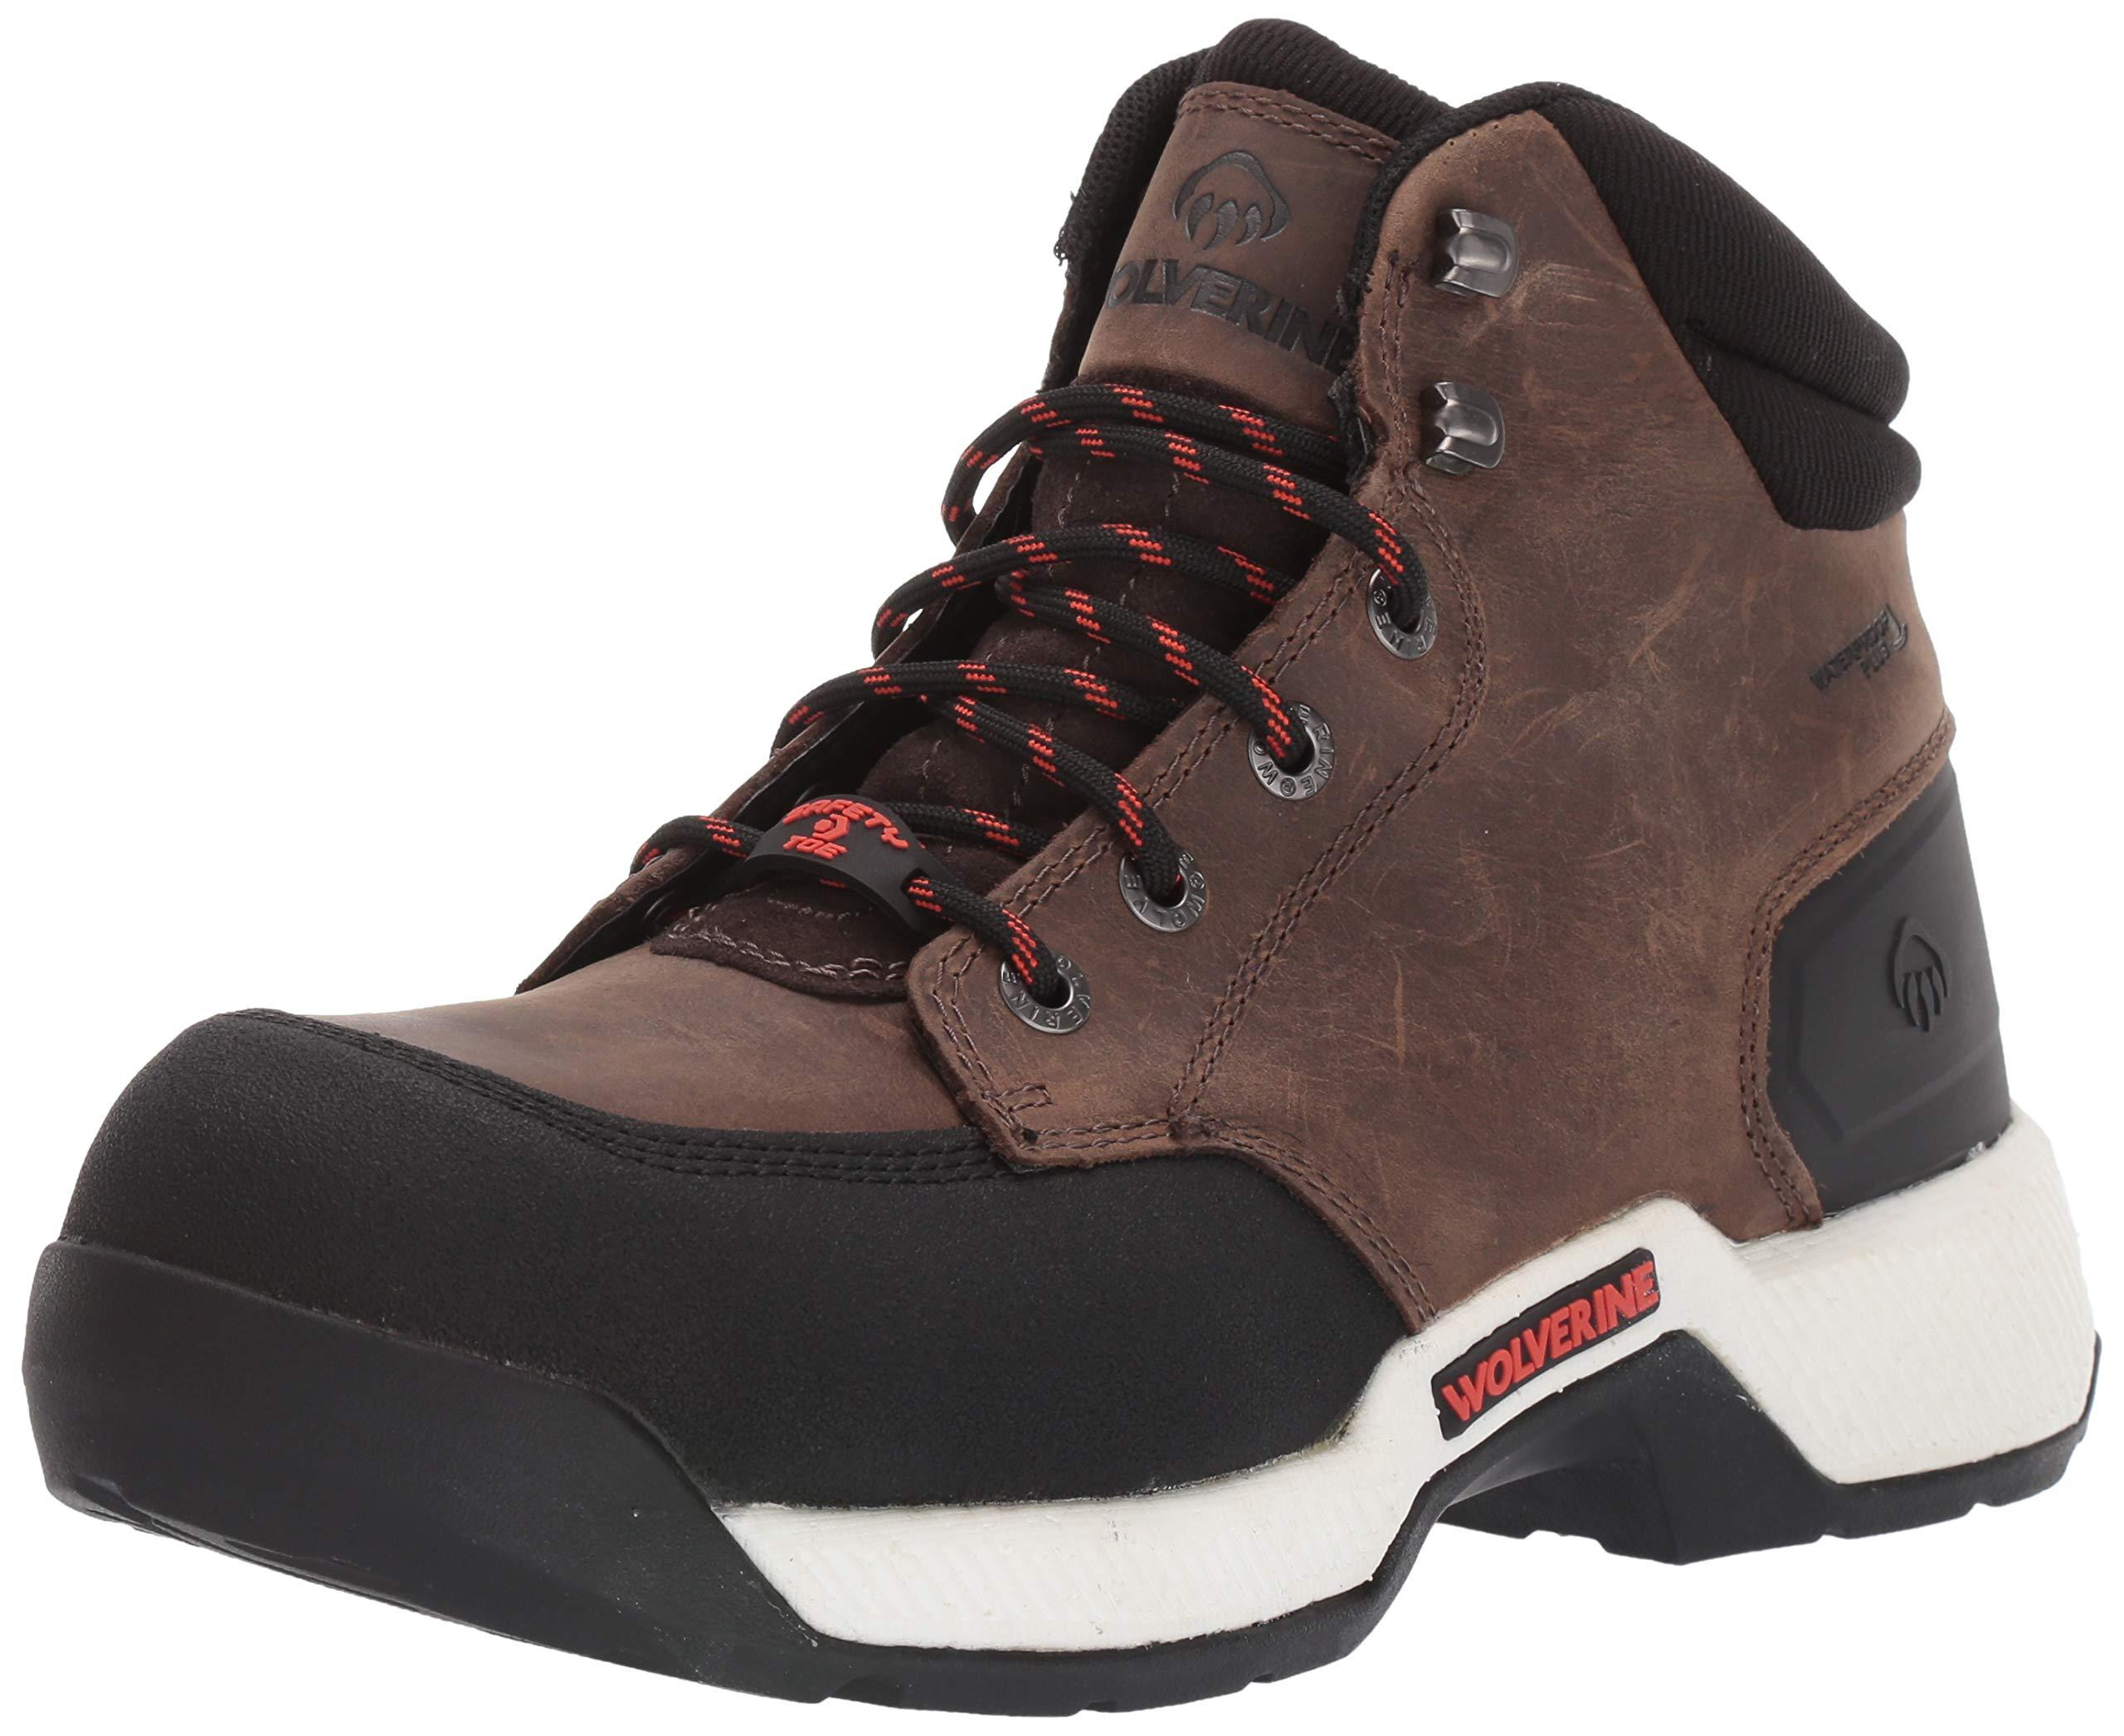 "Wolverine Men's Carom CarbonMax 6"" Work Boot Hiking"